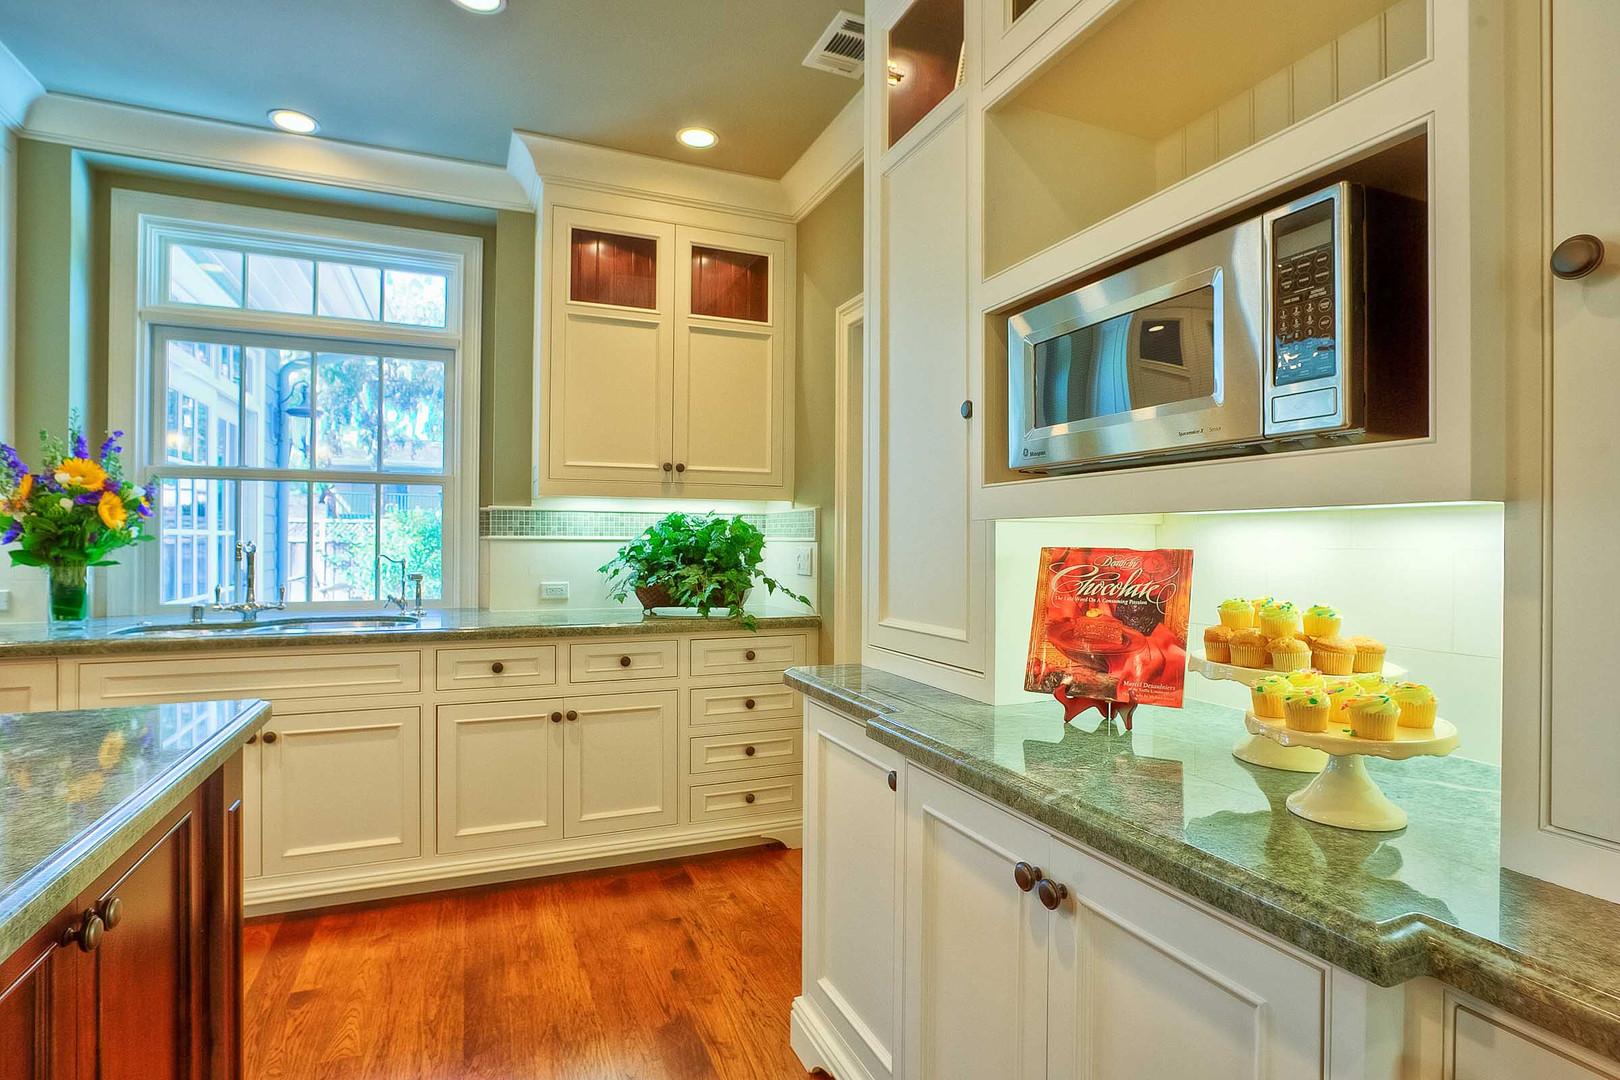 Transitional - East Creek - Kitchen - 1